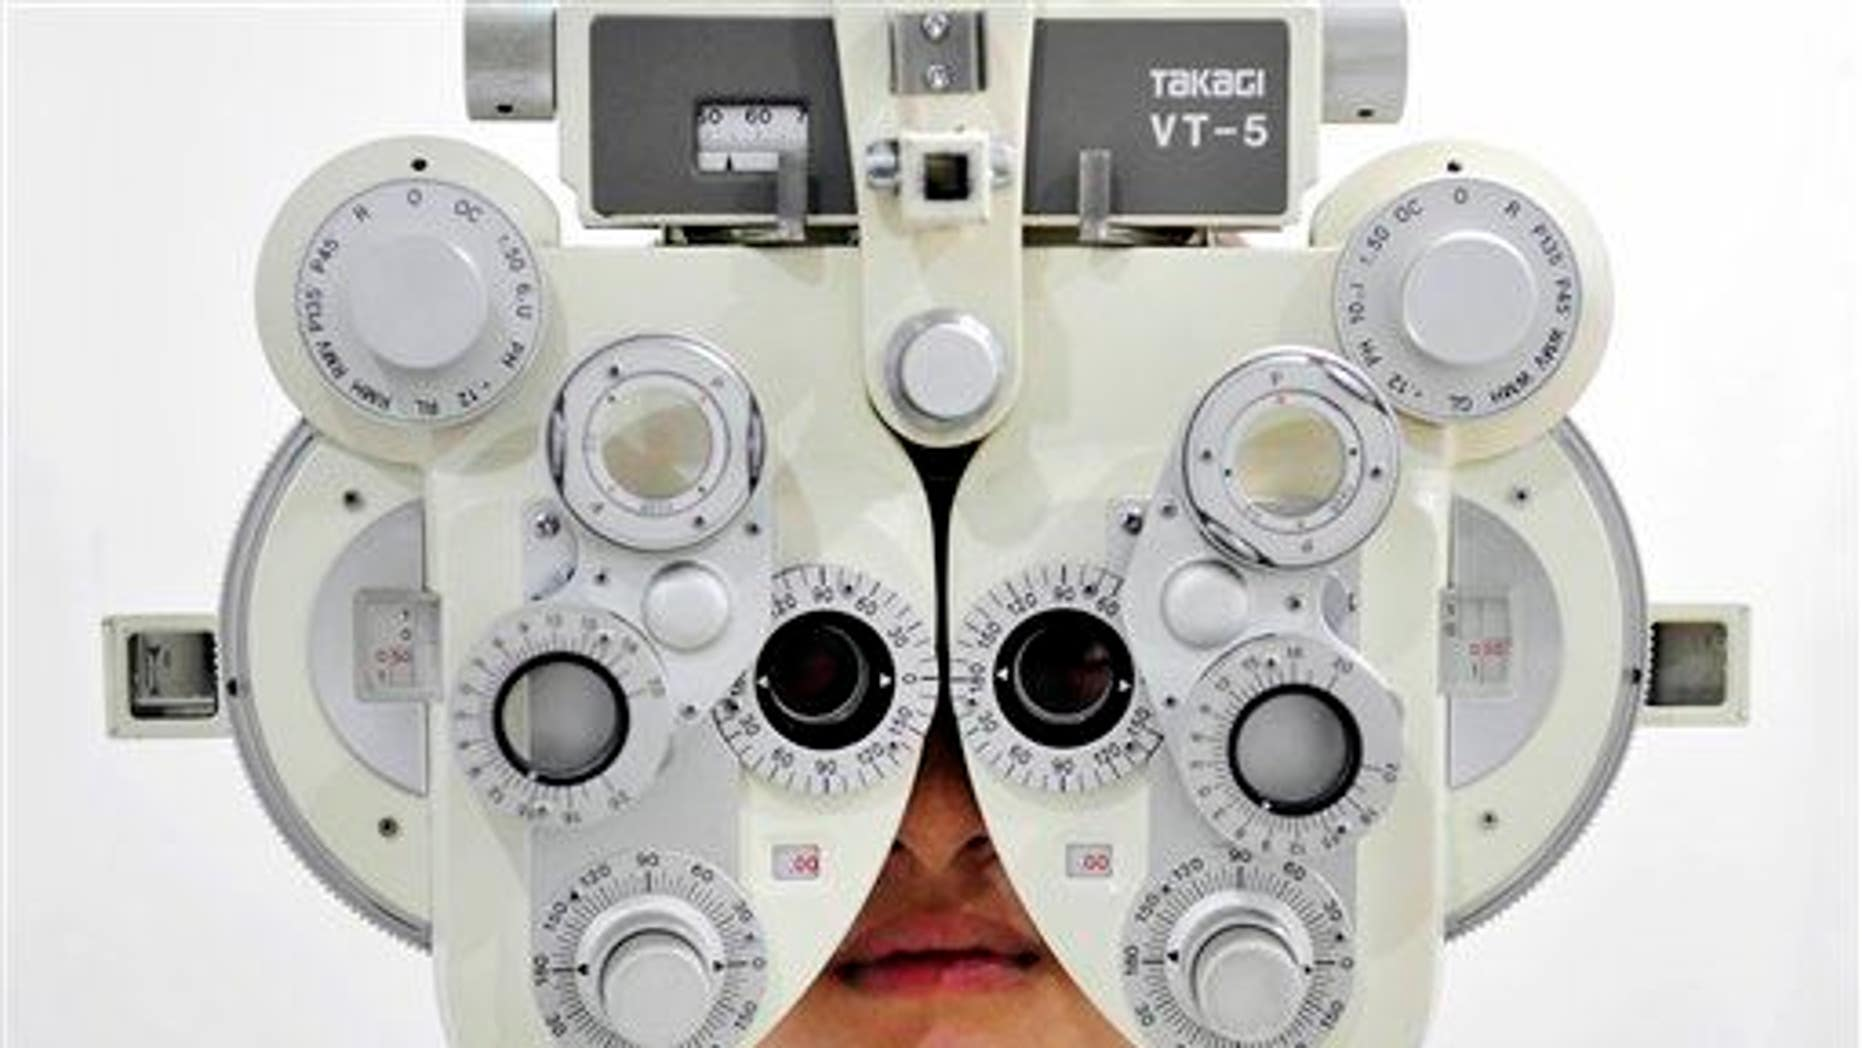 A near-sighted girl receives an eye sight examination.